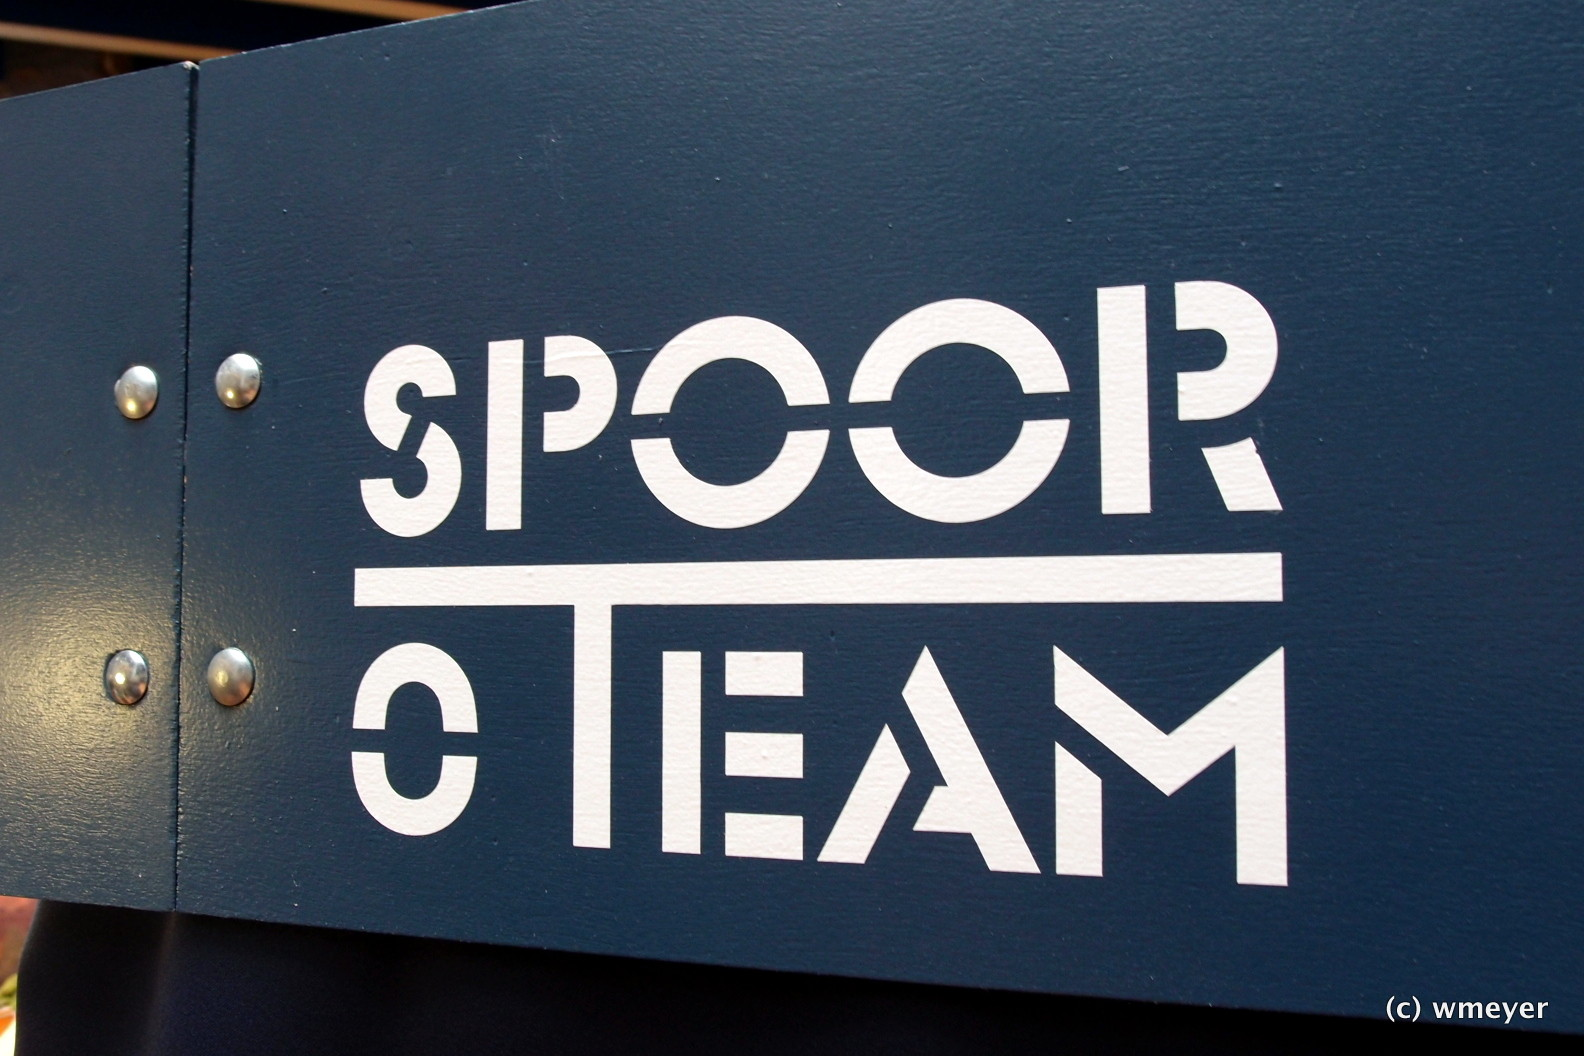 Straßenbahn-Anlage / Spoor Null Team